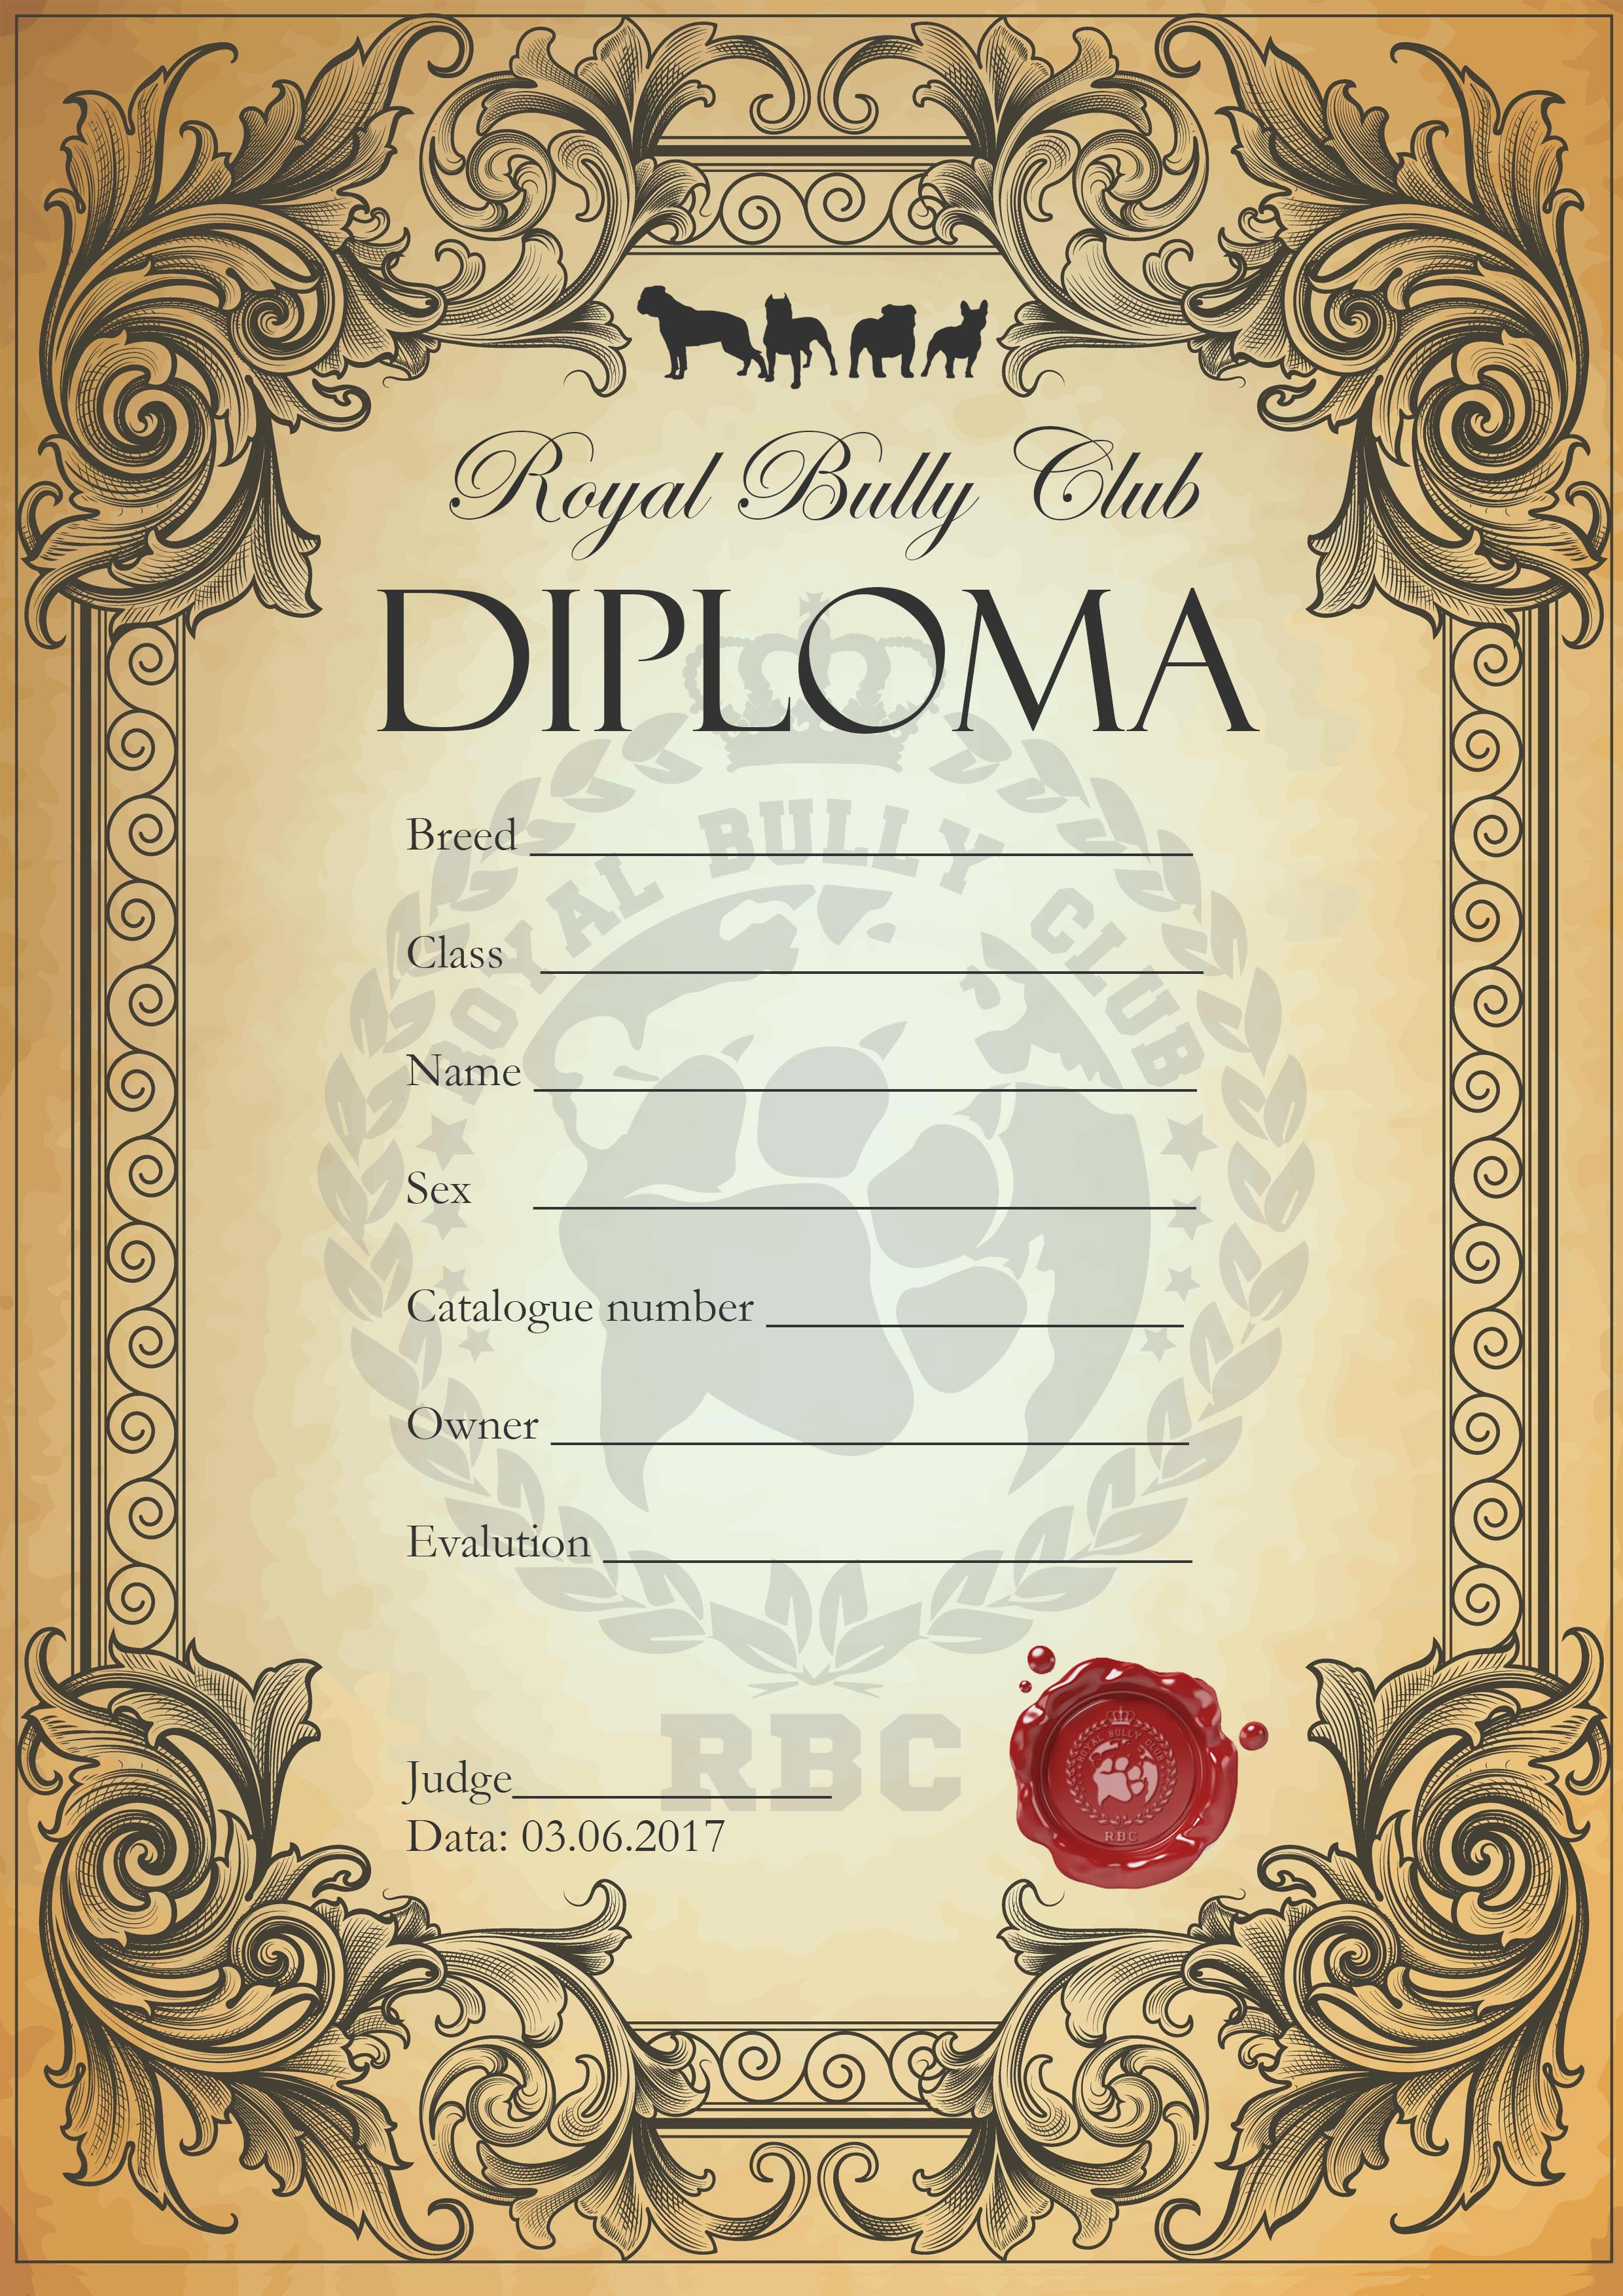 Diploma RBC